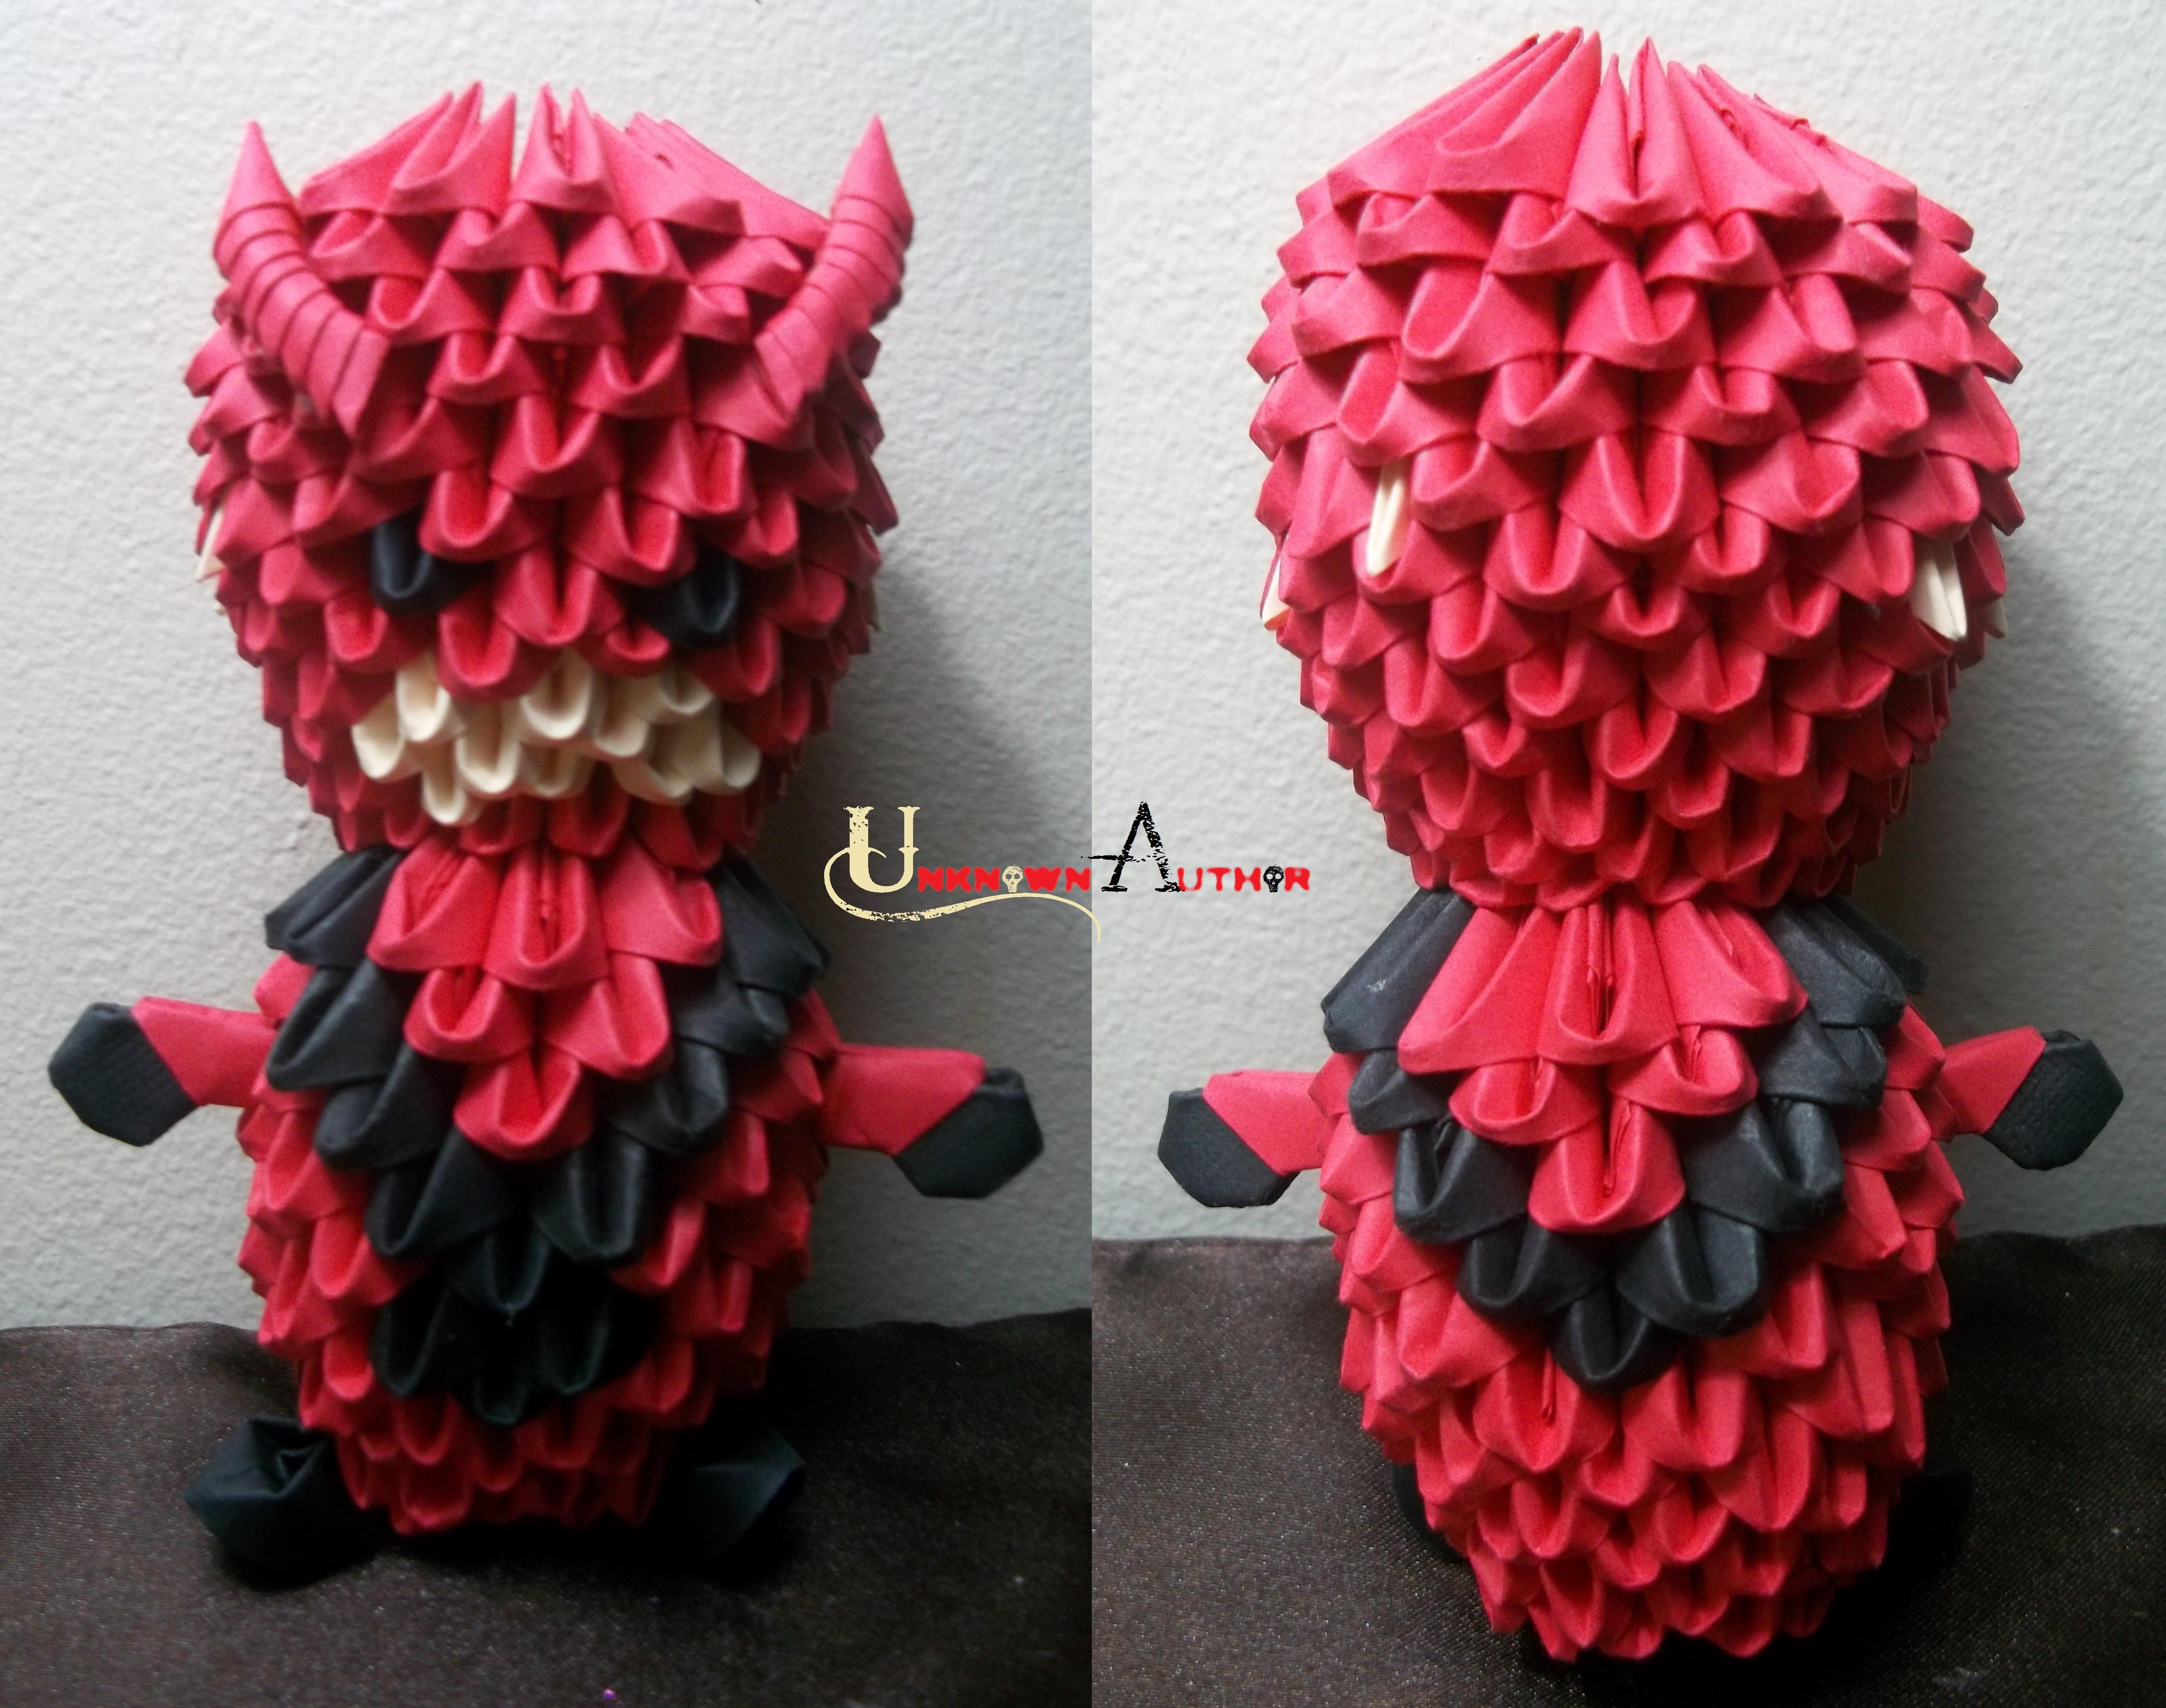 3d Origami Giant Man By Jobe3do On Deviantart